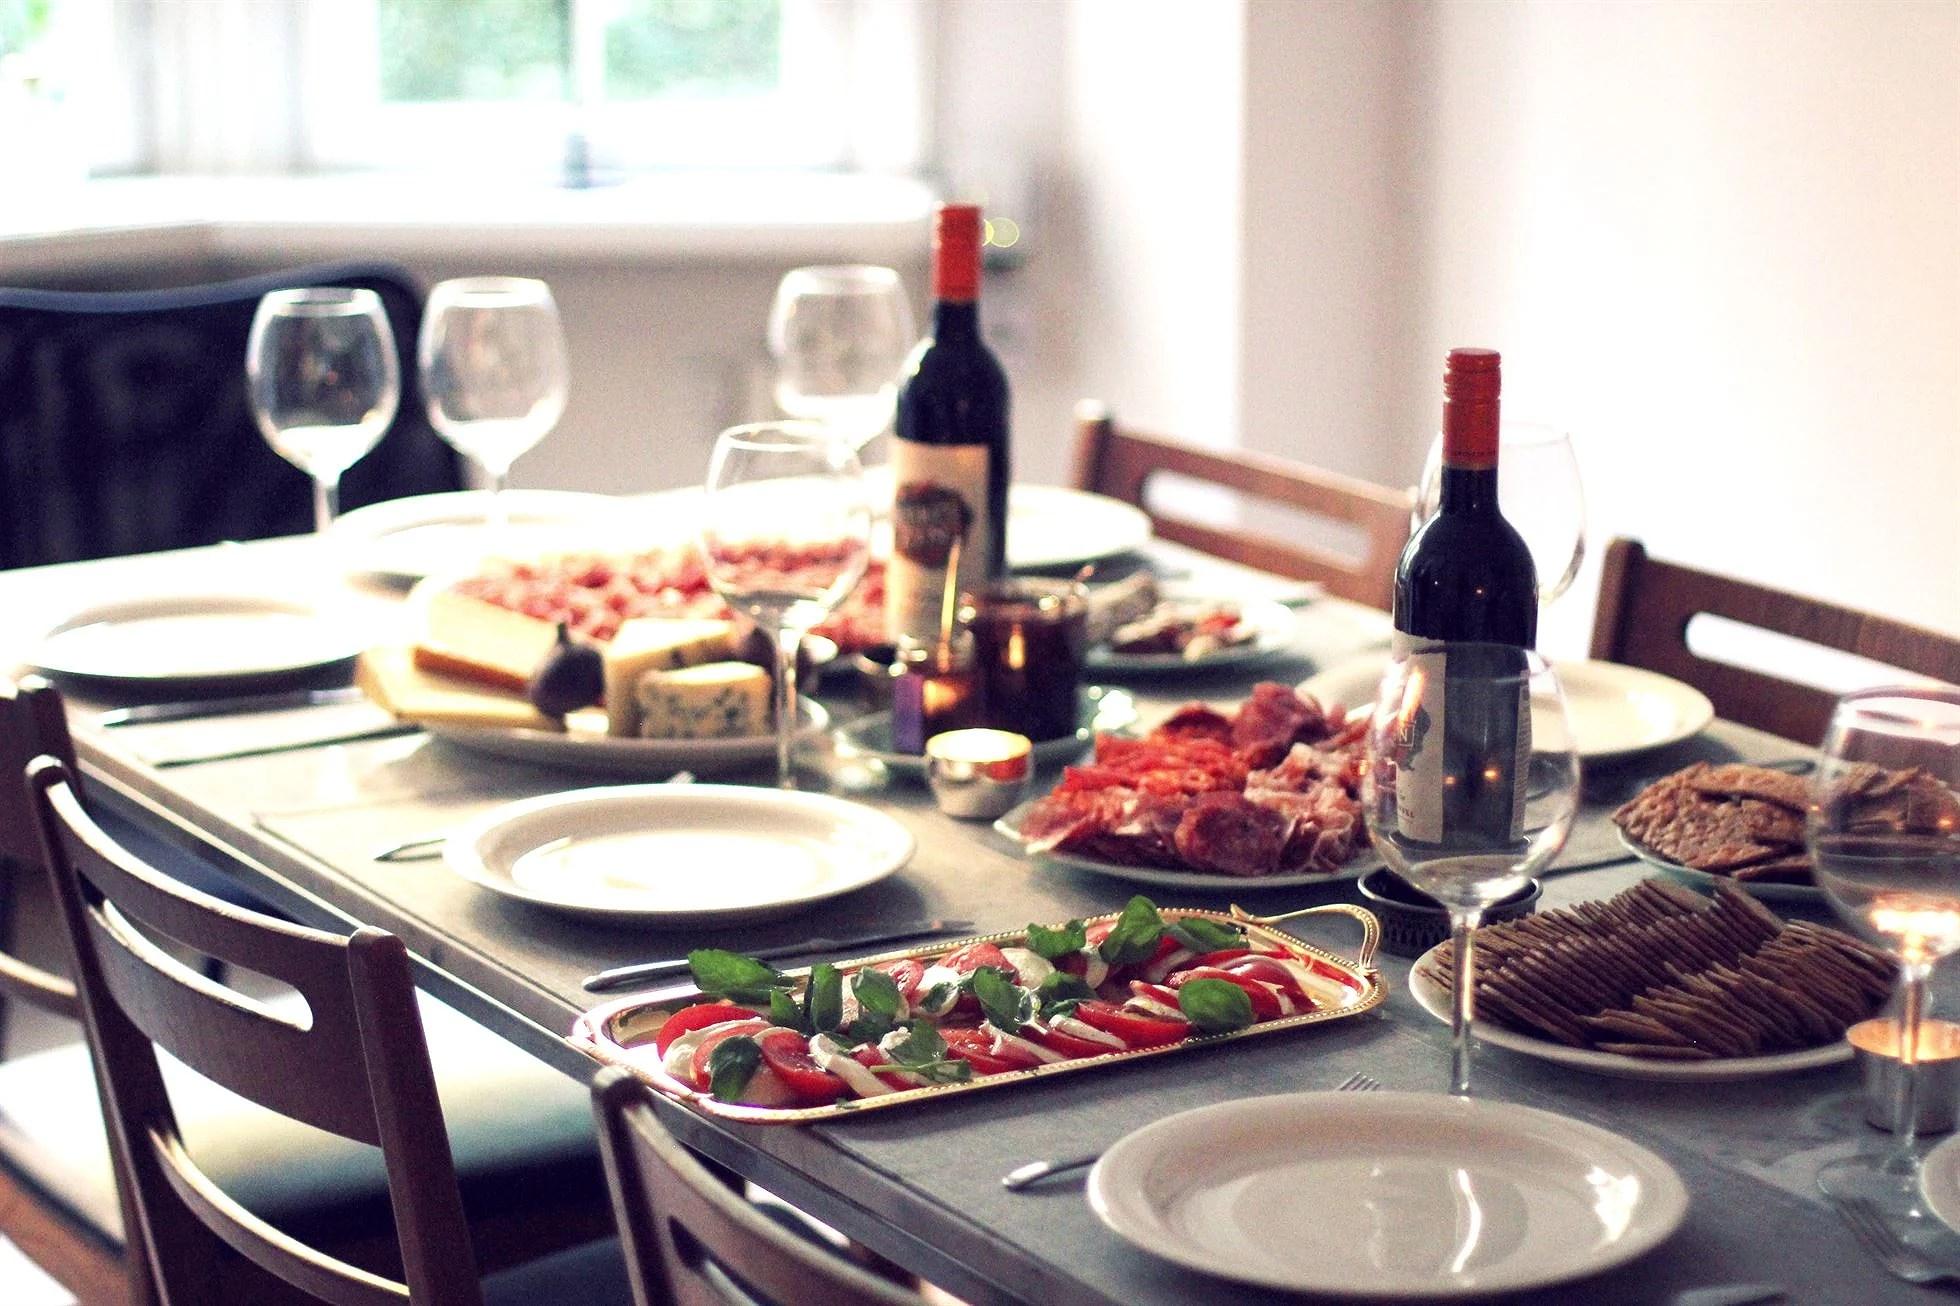 DINNER WITH METRO MODE